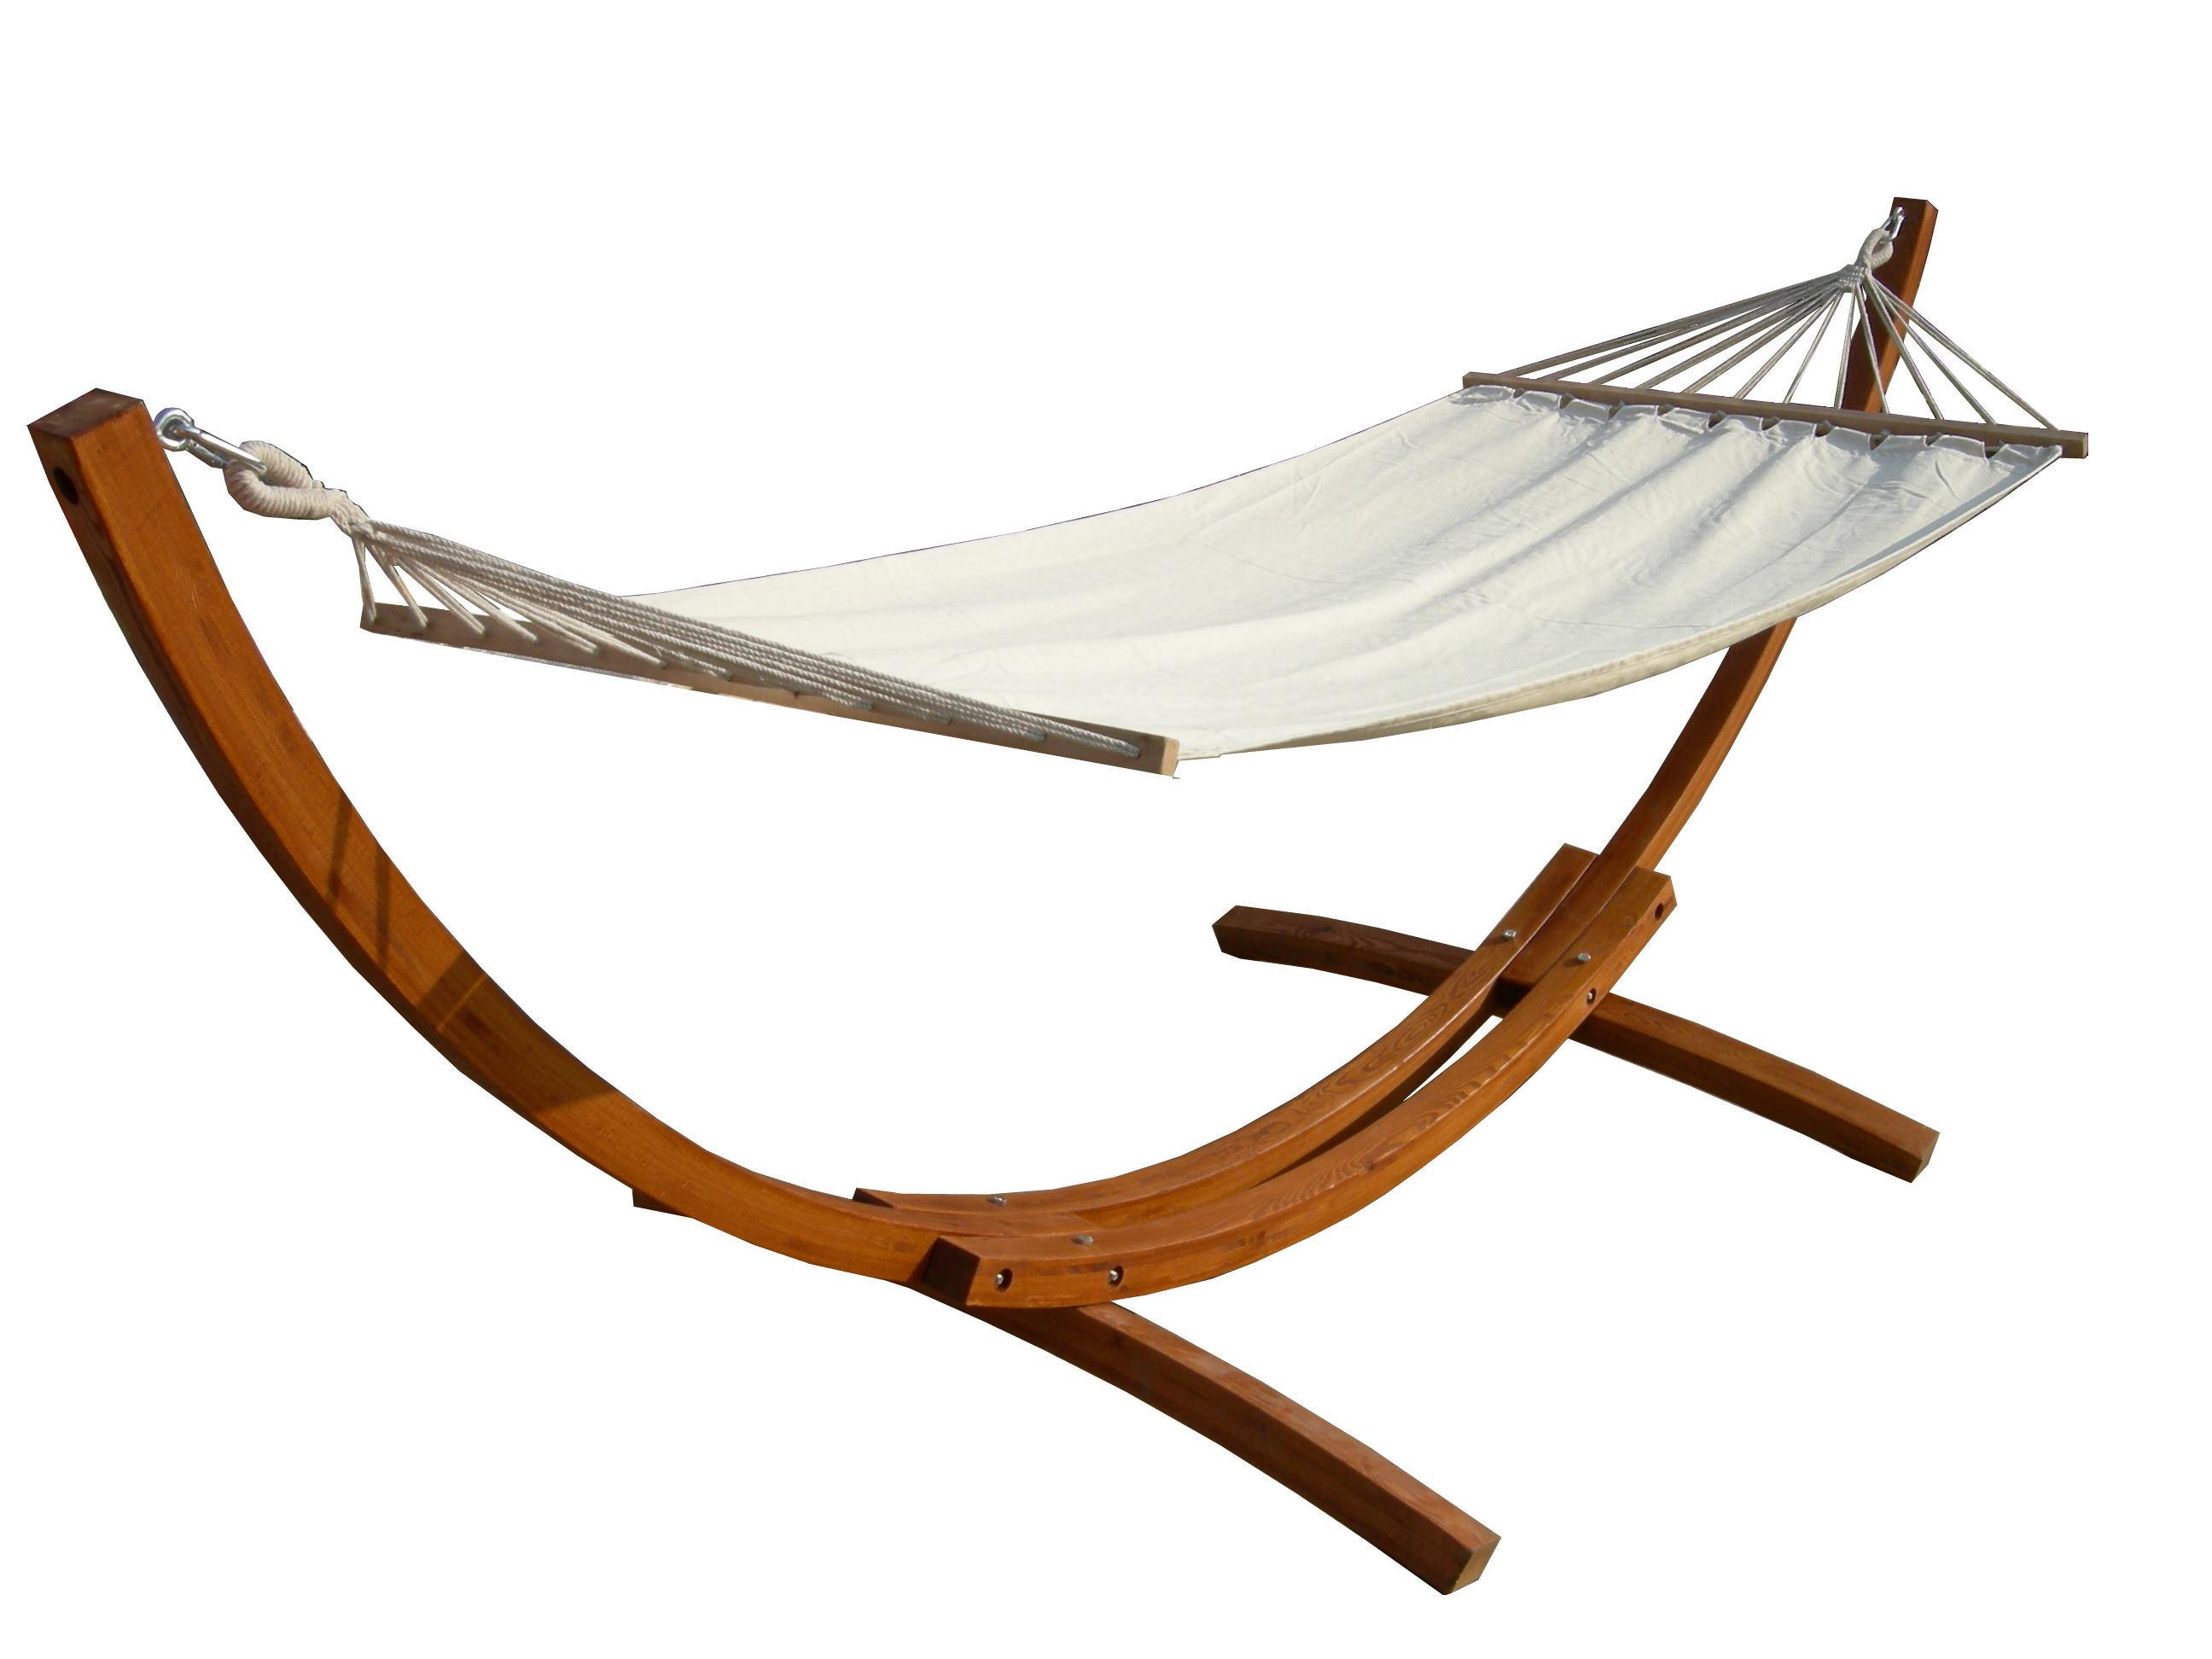 Luxury Elegant High Standard Wooden Hammock